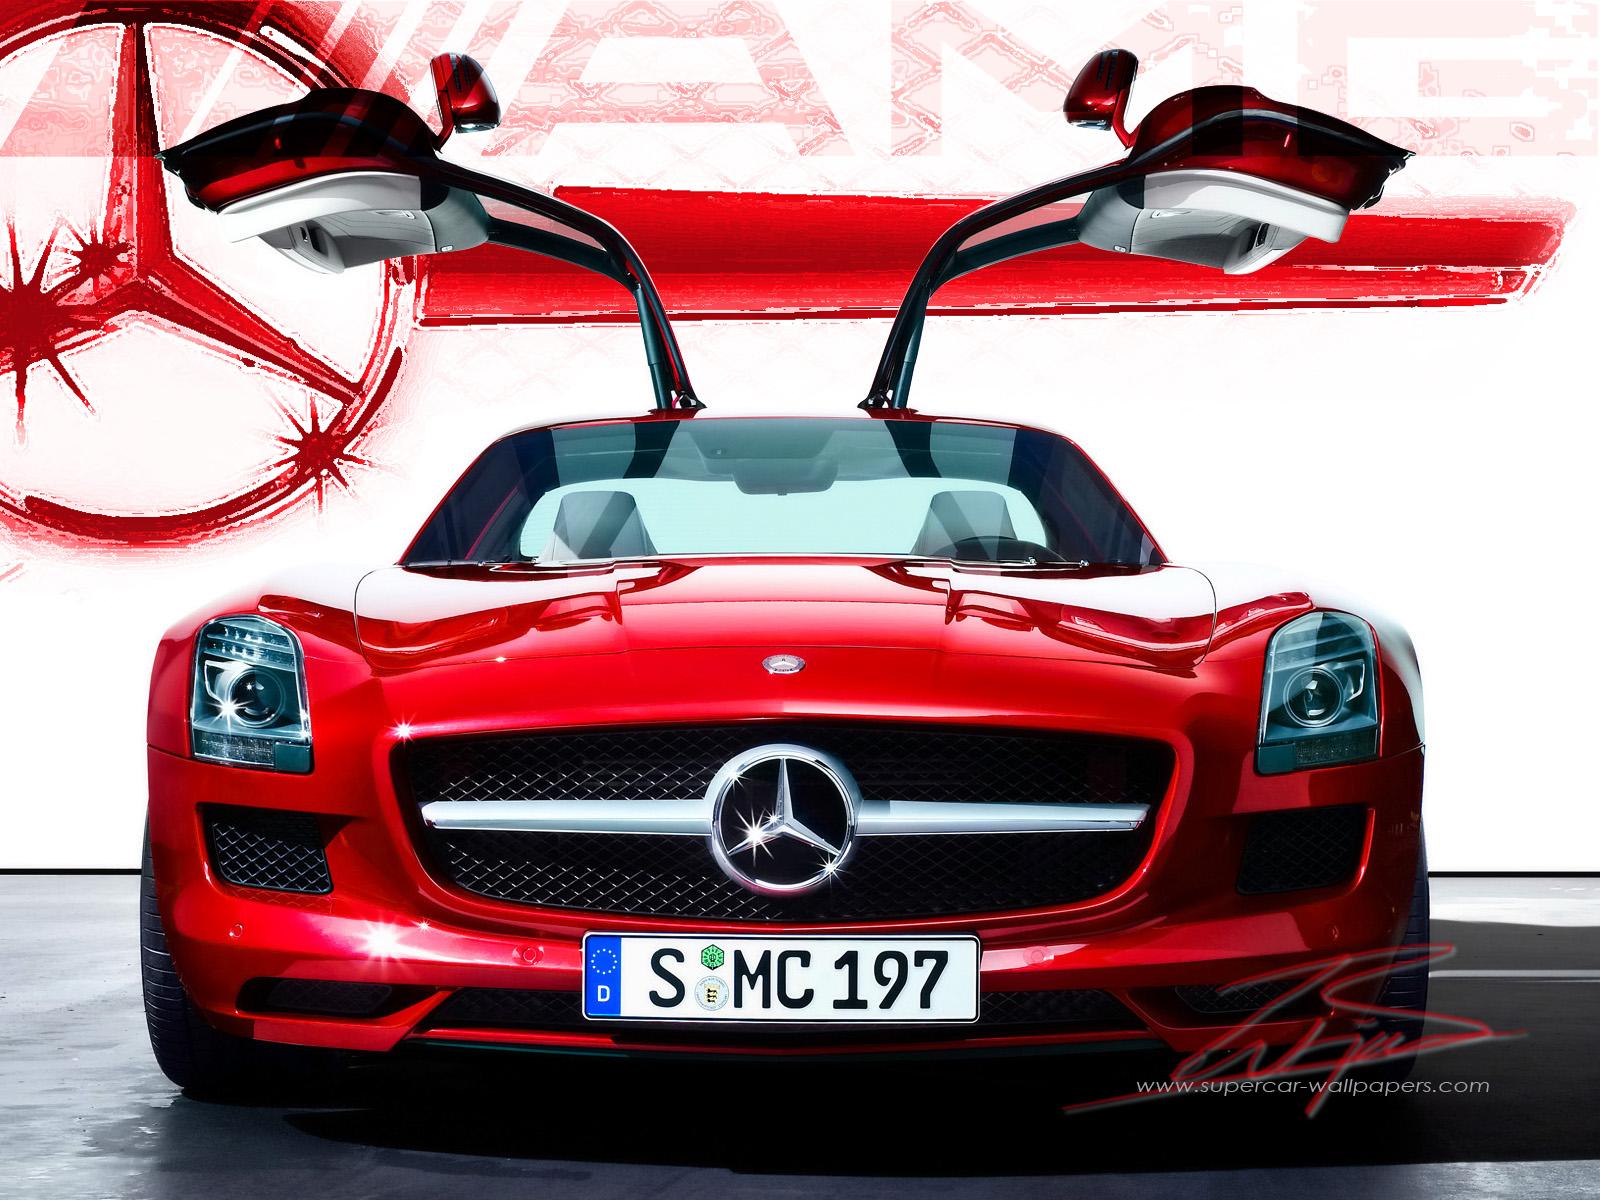 http://4.bp.blogspot.com/-_sqW9xj9Y8s/Tp03HZtm17I/AAAAAAAAAQM/PQ6unqGDlyA/s1600/Mercedes+SLS+AMG+1600.jpg